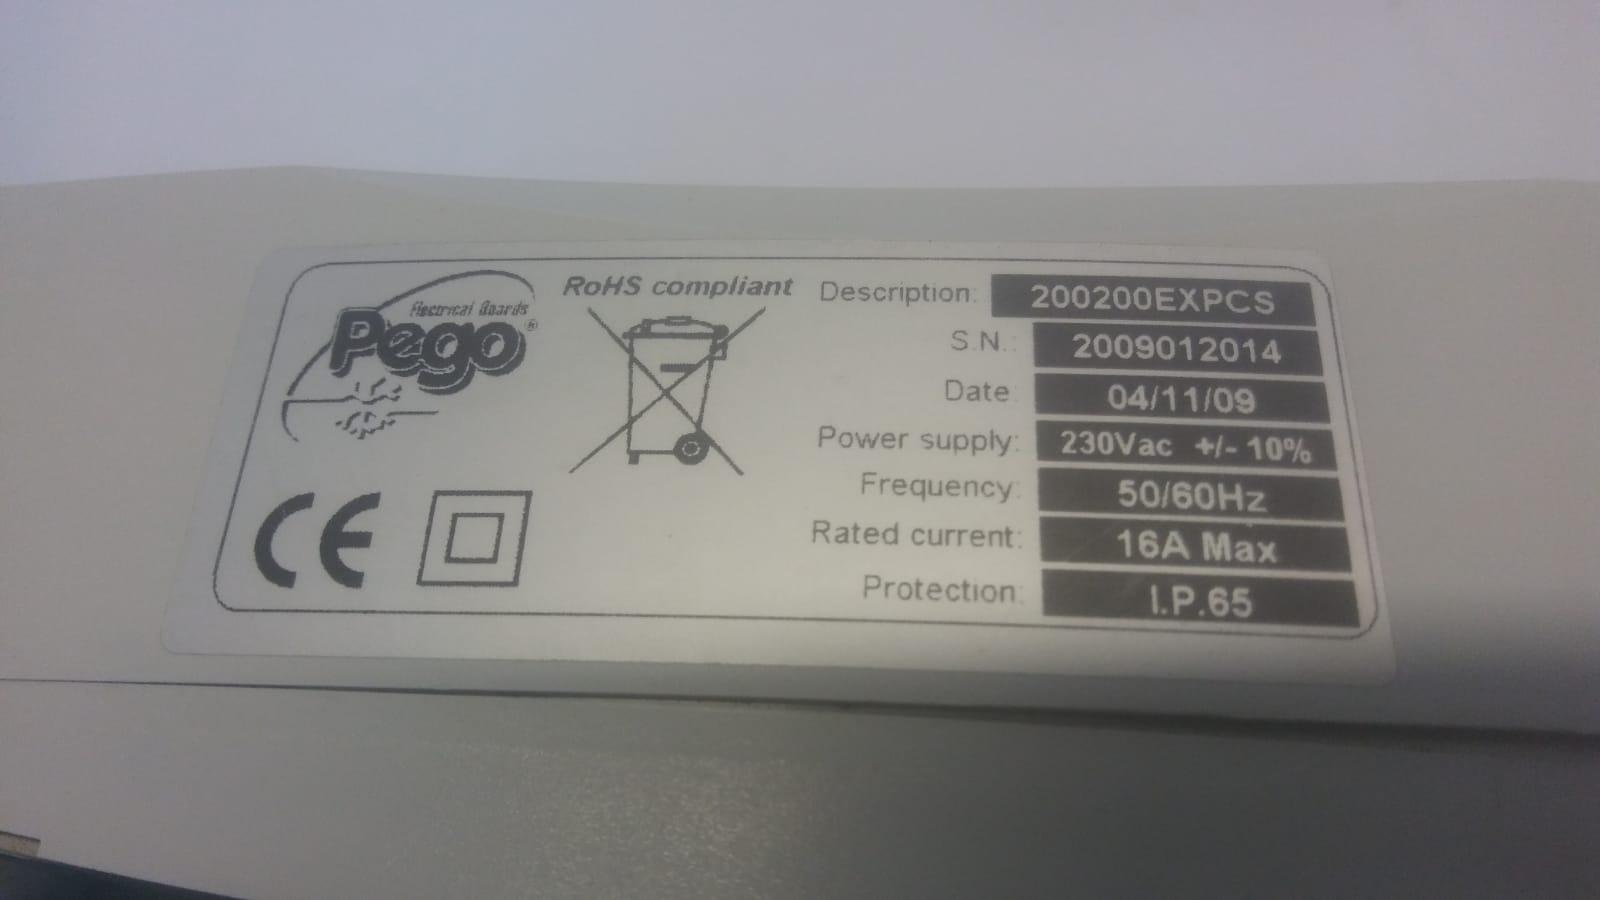 Quadro elettrico - Pego serie 200 Expert 200200EXPCS in vendita - foto 2